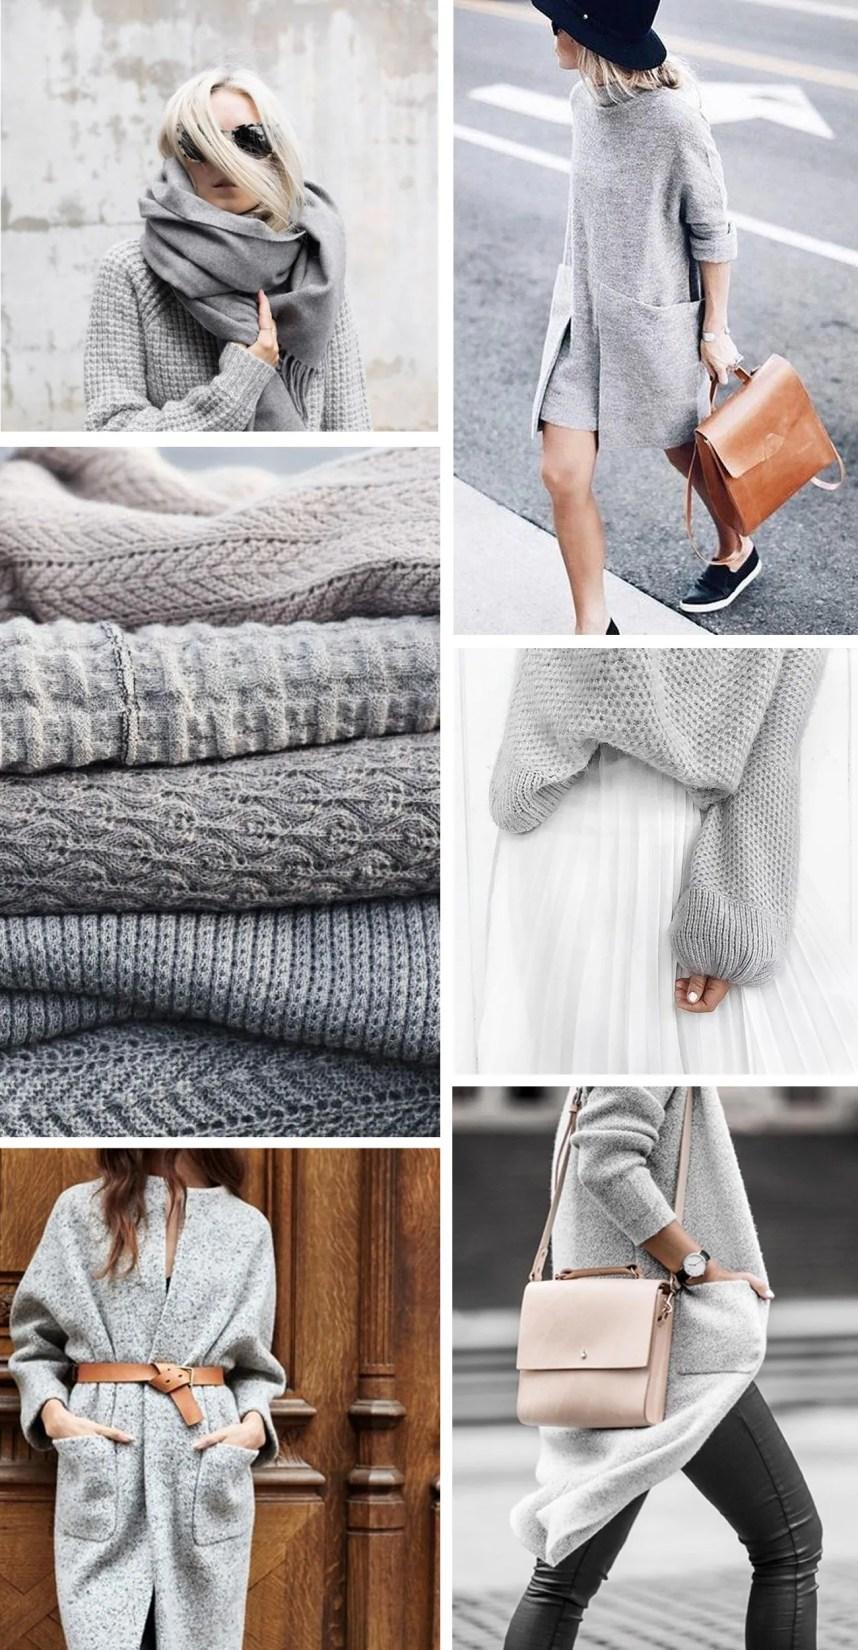 grey_nordic_style_cardigan_jumper_simplistic